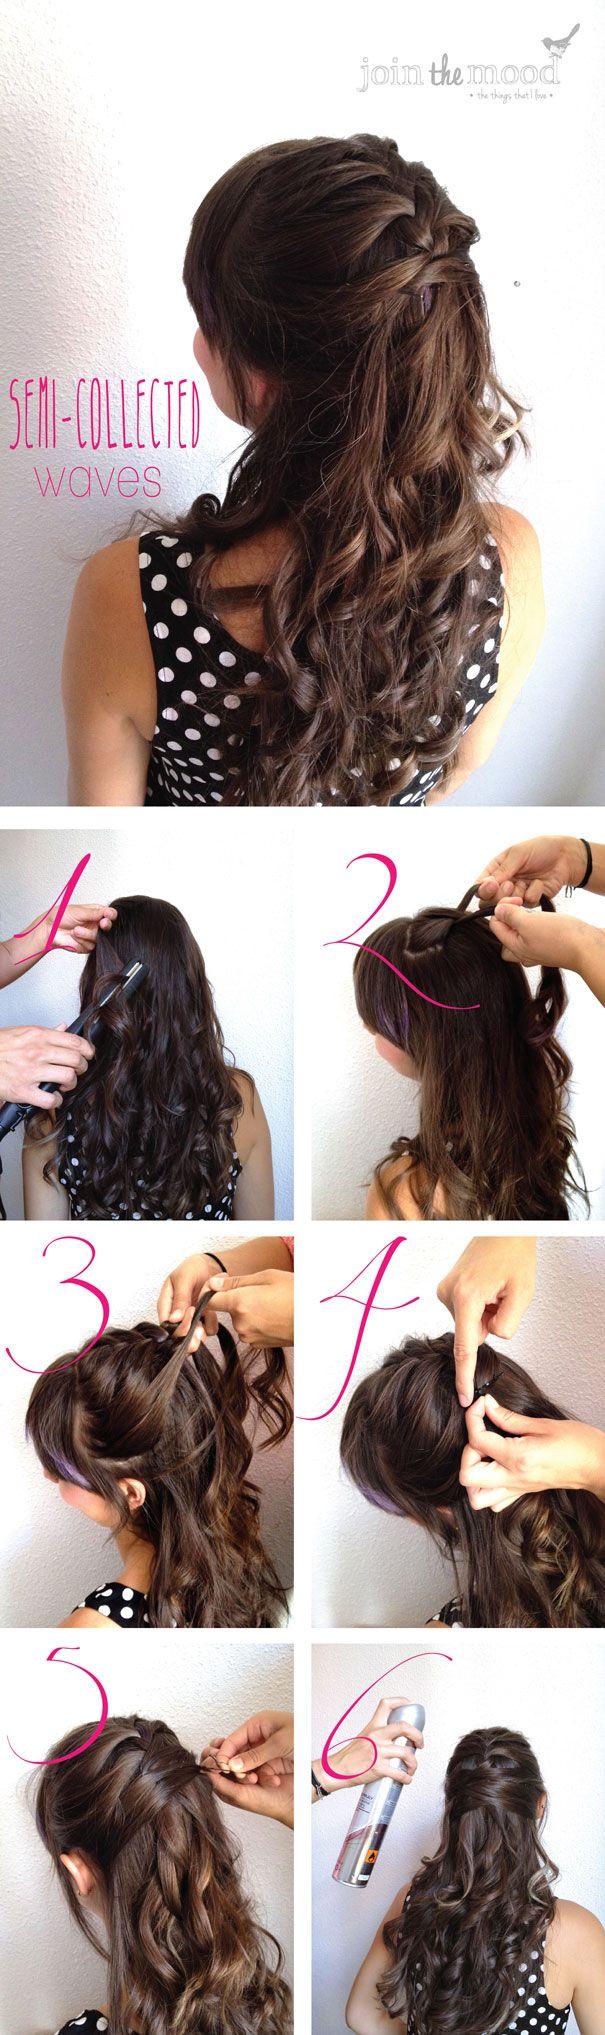 15 Hair Tutorials For All Summer Long